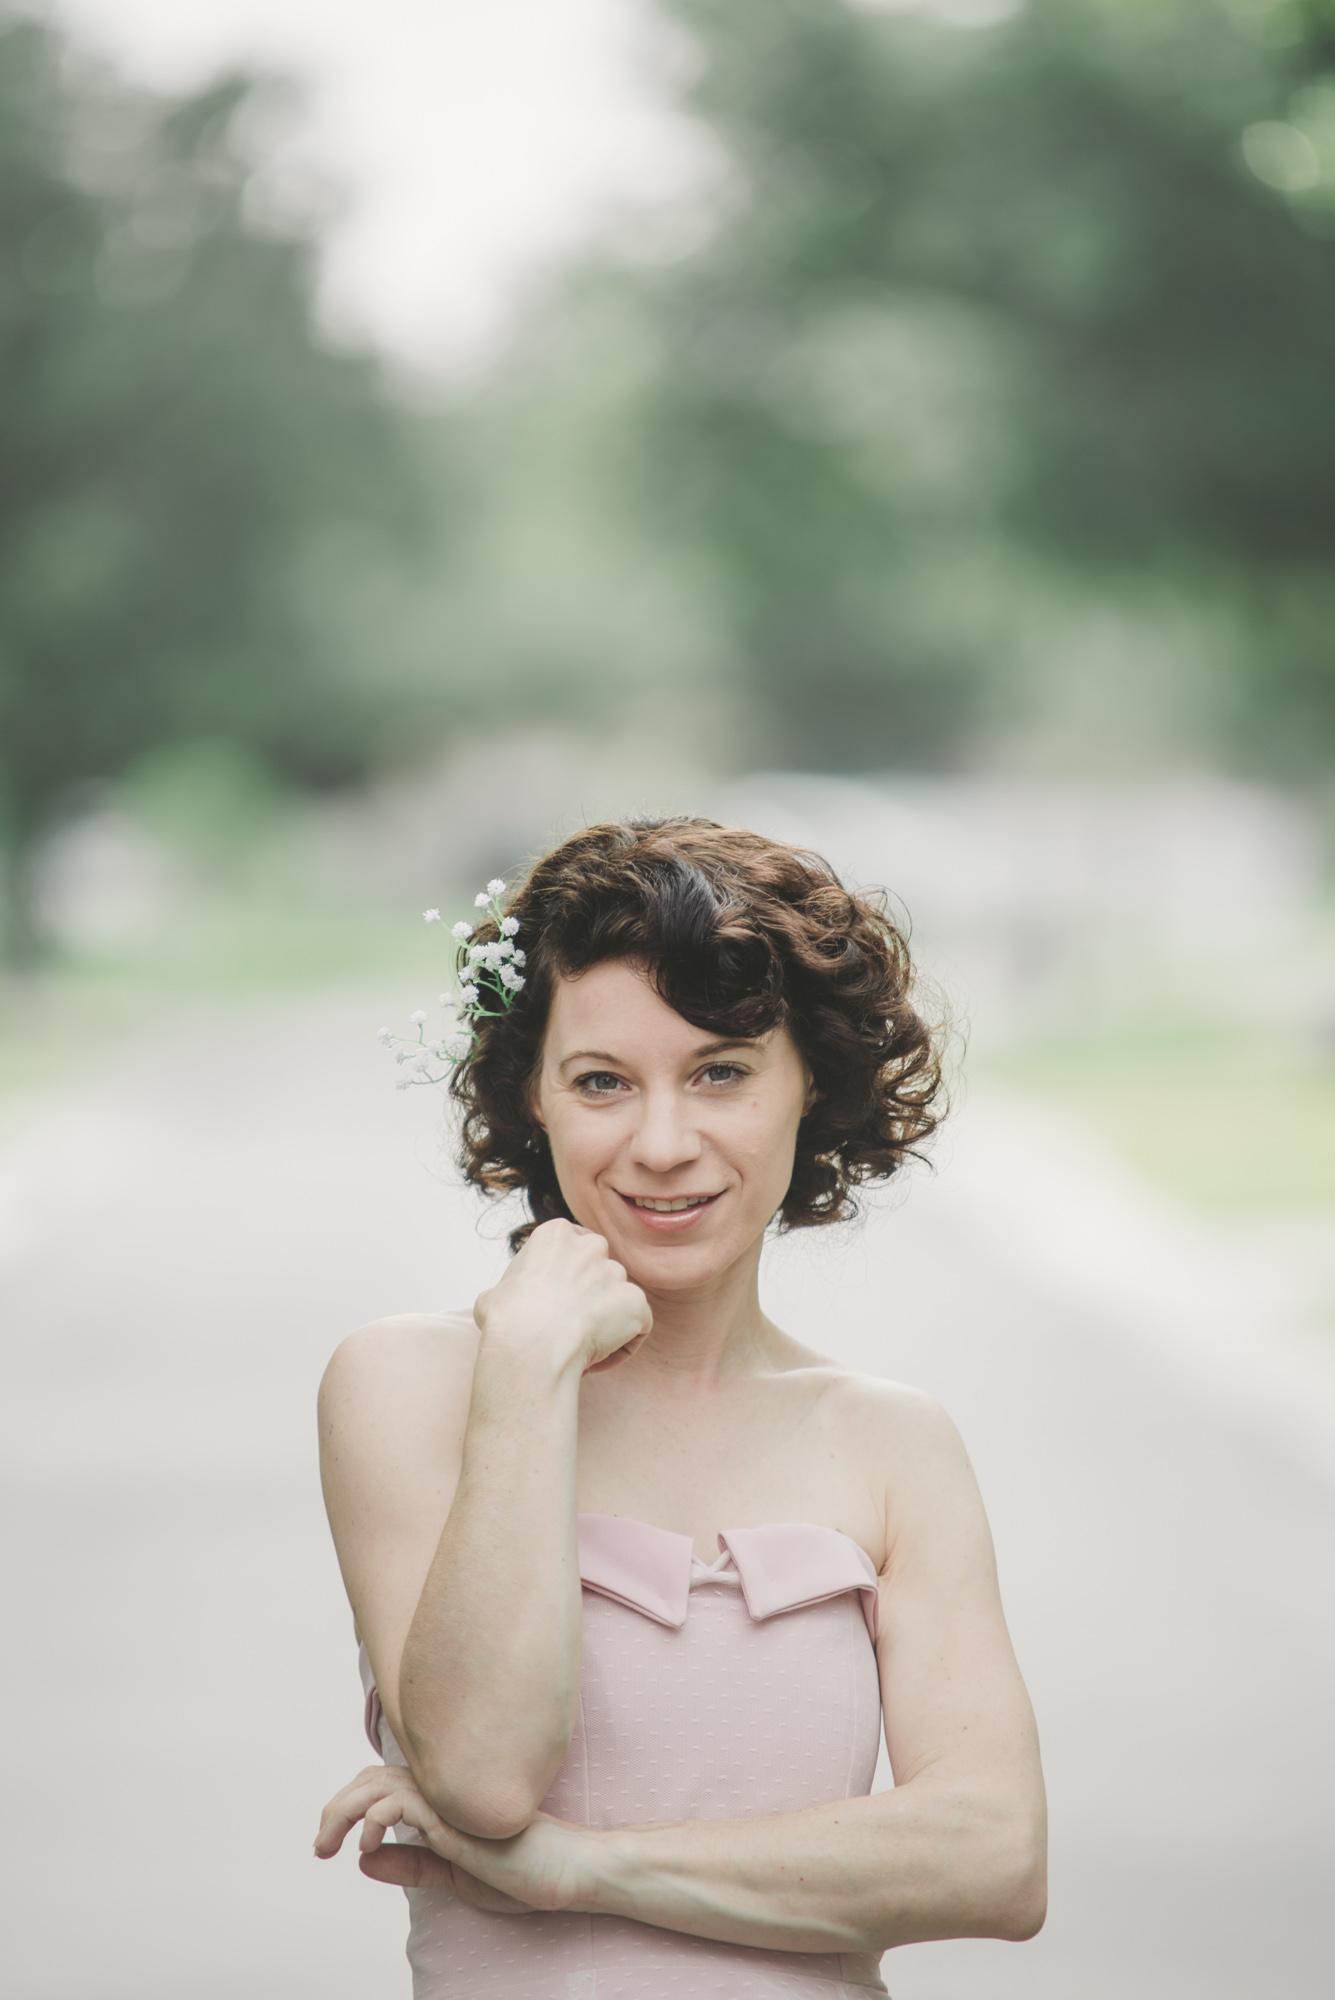 Lorraine Baines Prom Dress